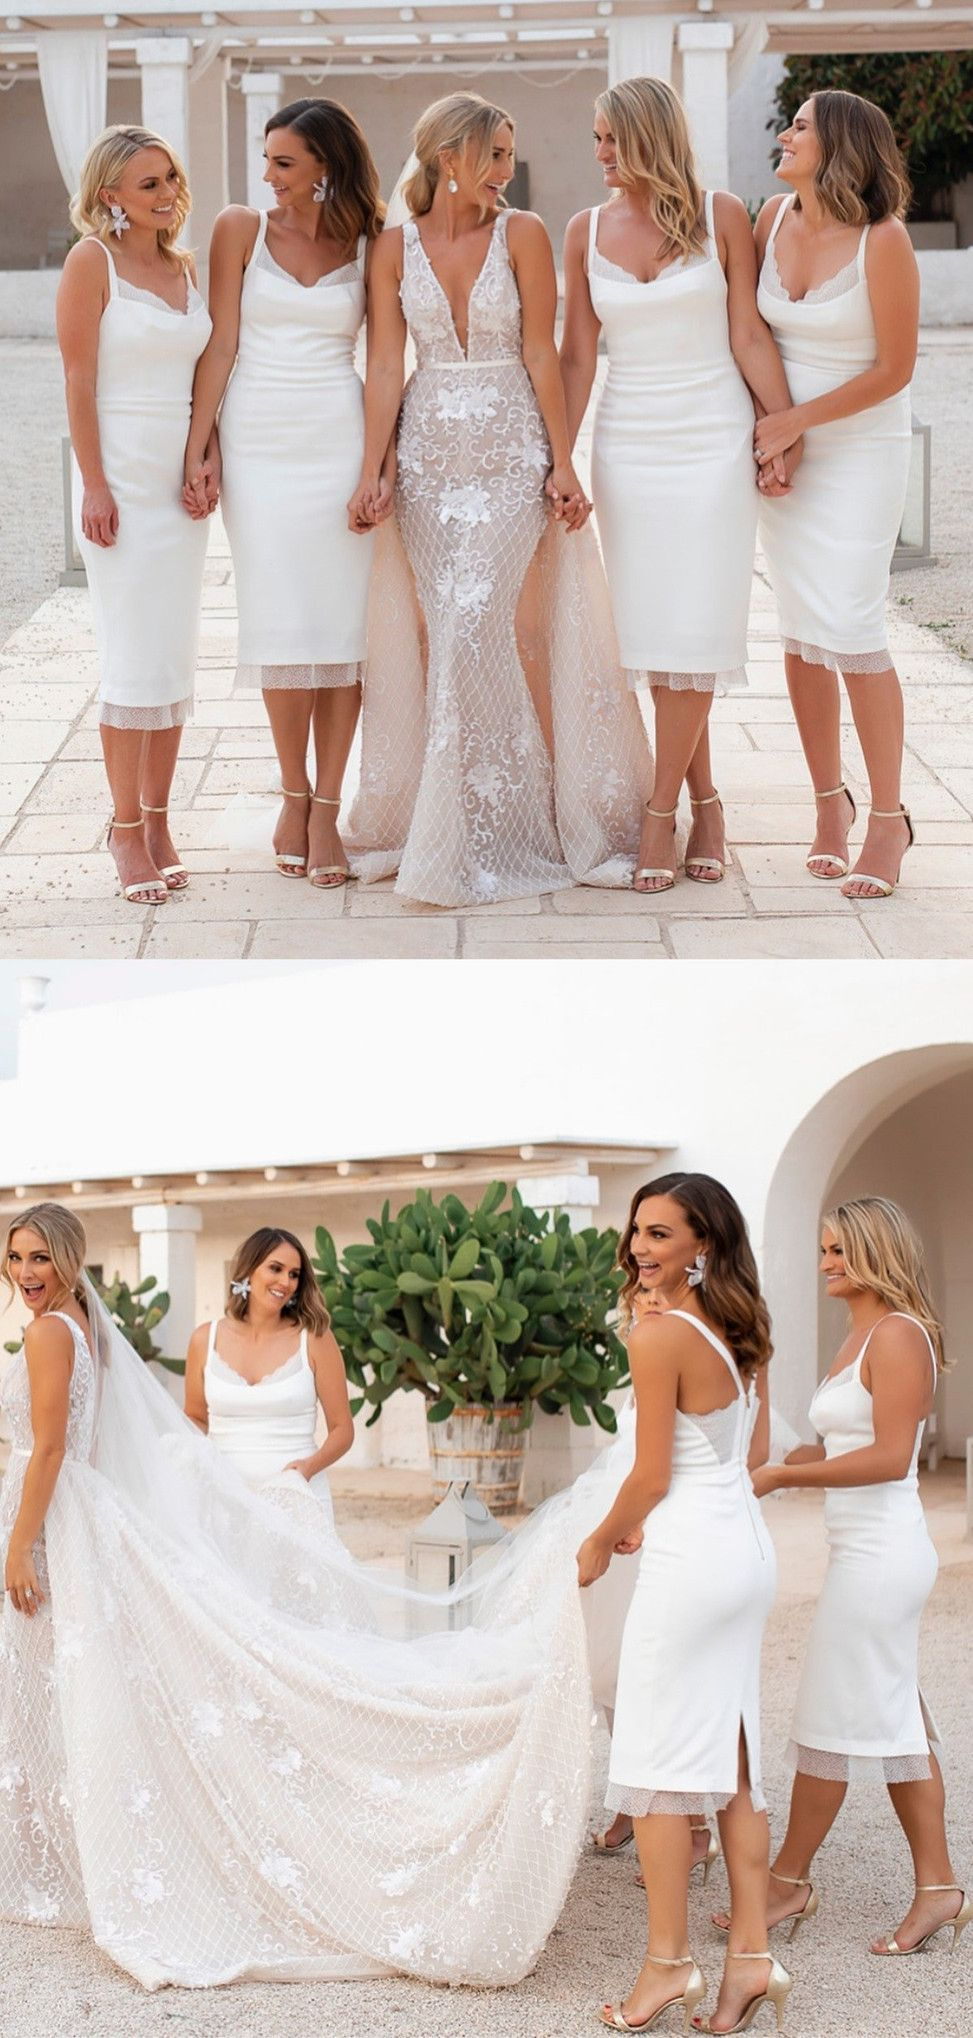 Elegant Tight Short White Bridesmaid Dresses Simple Wedding Party Go White Bridesmaid Dresses Short White Bridesmaid Dresses White Bridesmaid Dress Mismatched